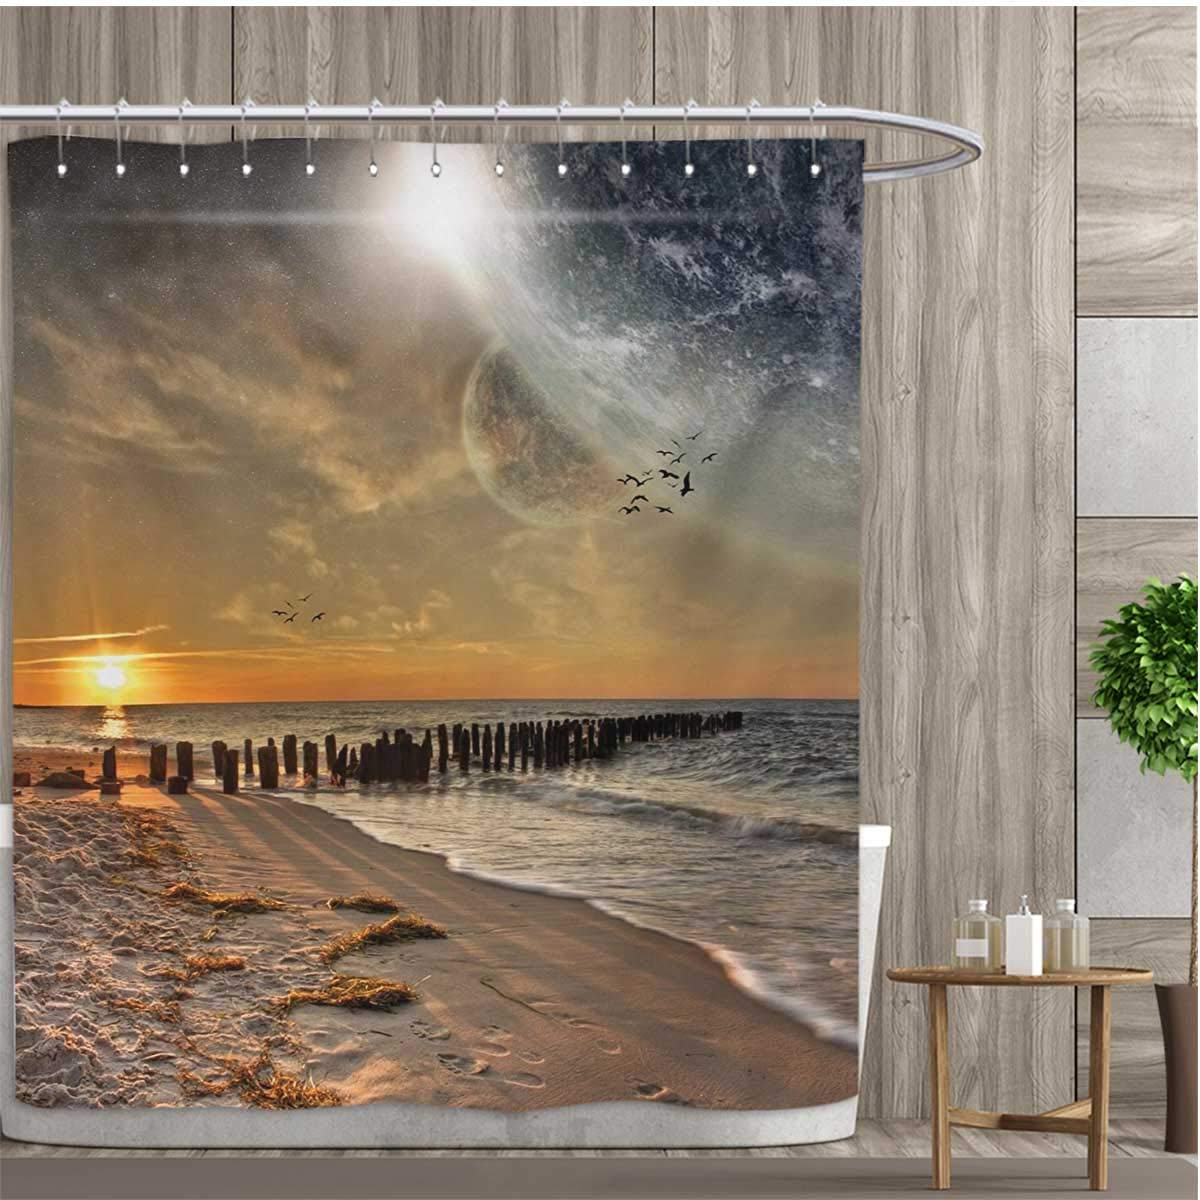 smallfly Space Bathroom Accessories Magical Solar Eclipse on Beach Ocean with Horizon Sun Moon Globe Gulls Flying View Shower Curtains Fabric Extra Long 48''x72'' Cream Orange